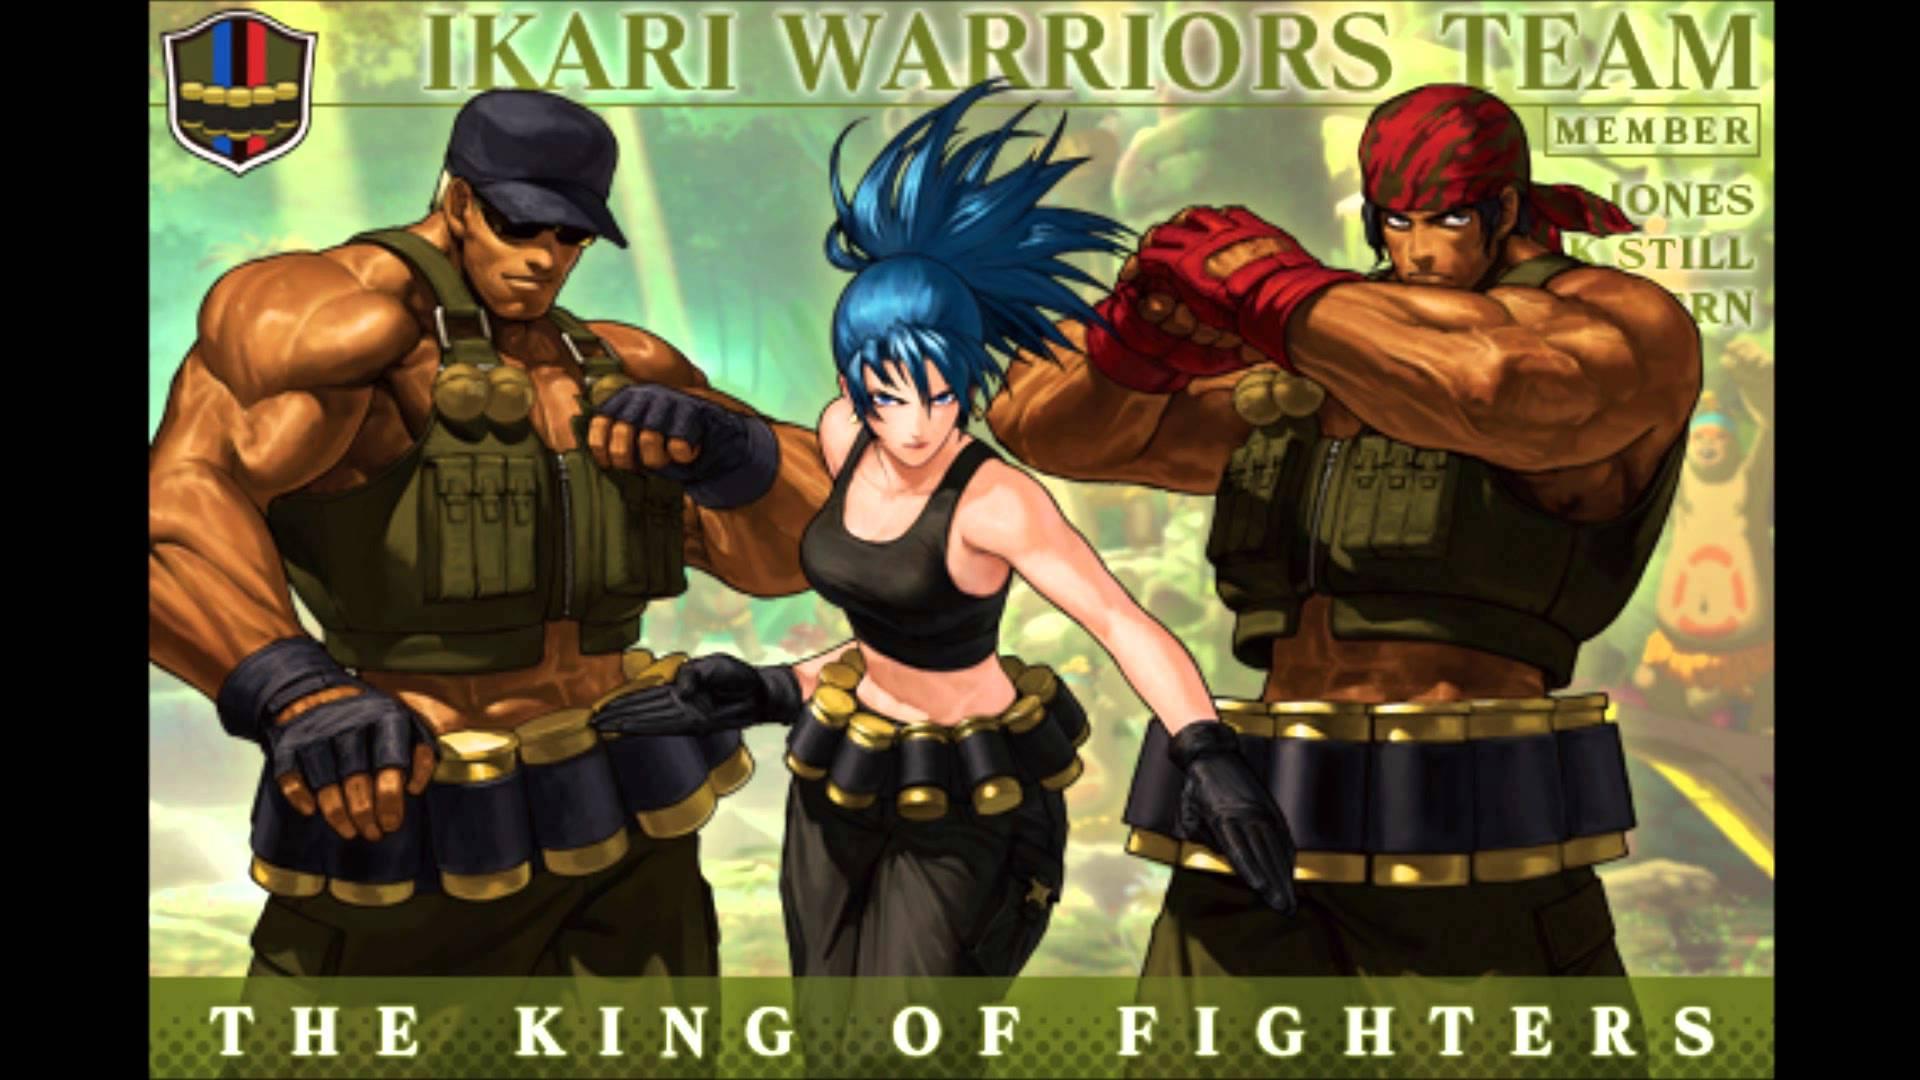 1920x1080 > Ikari Warriors Wallpapers